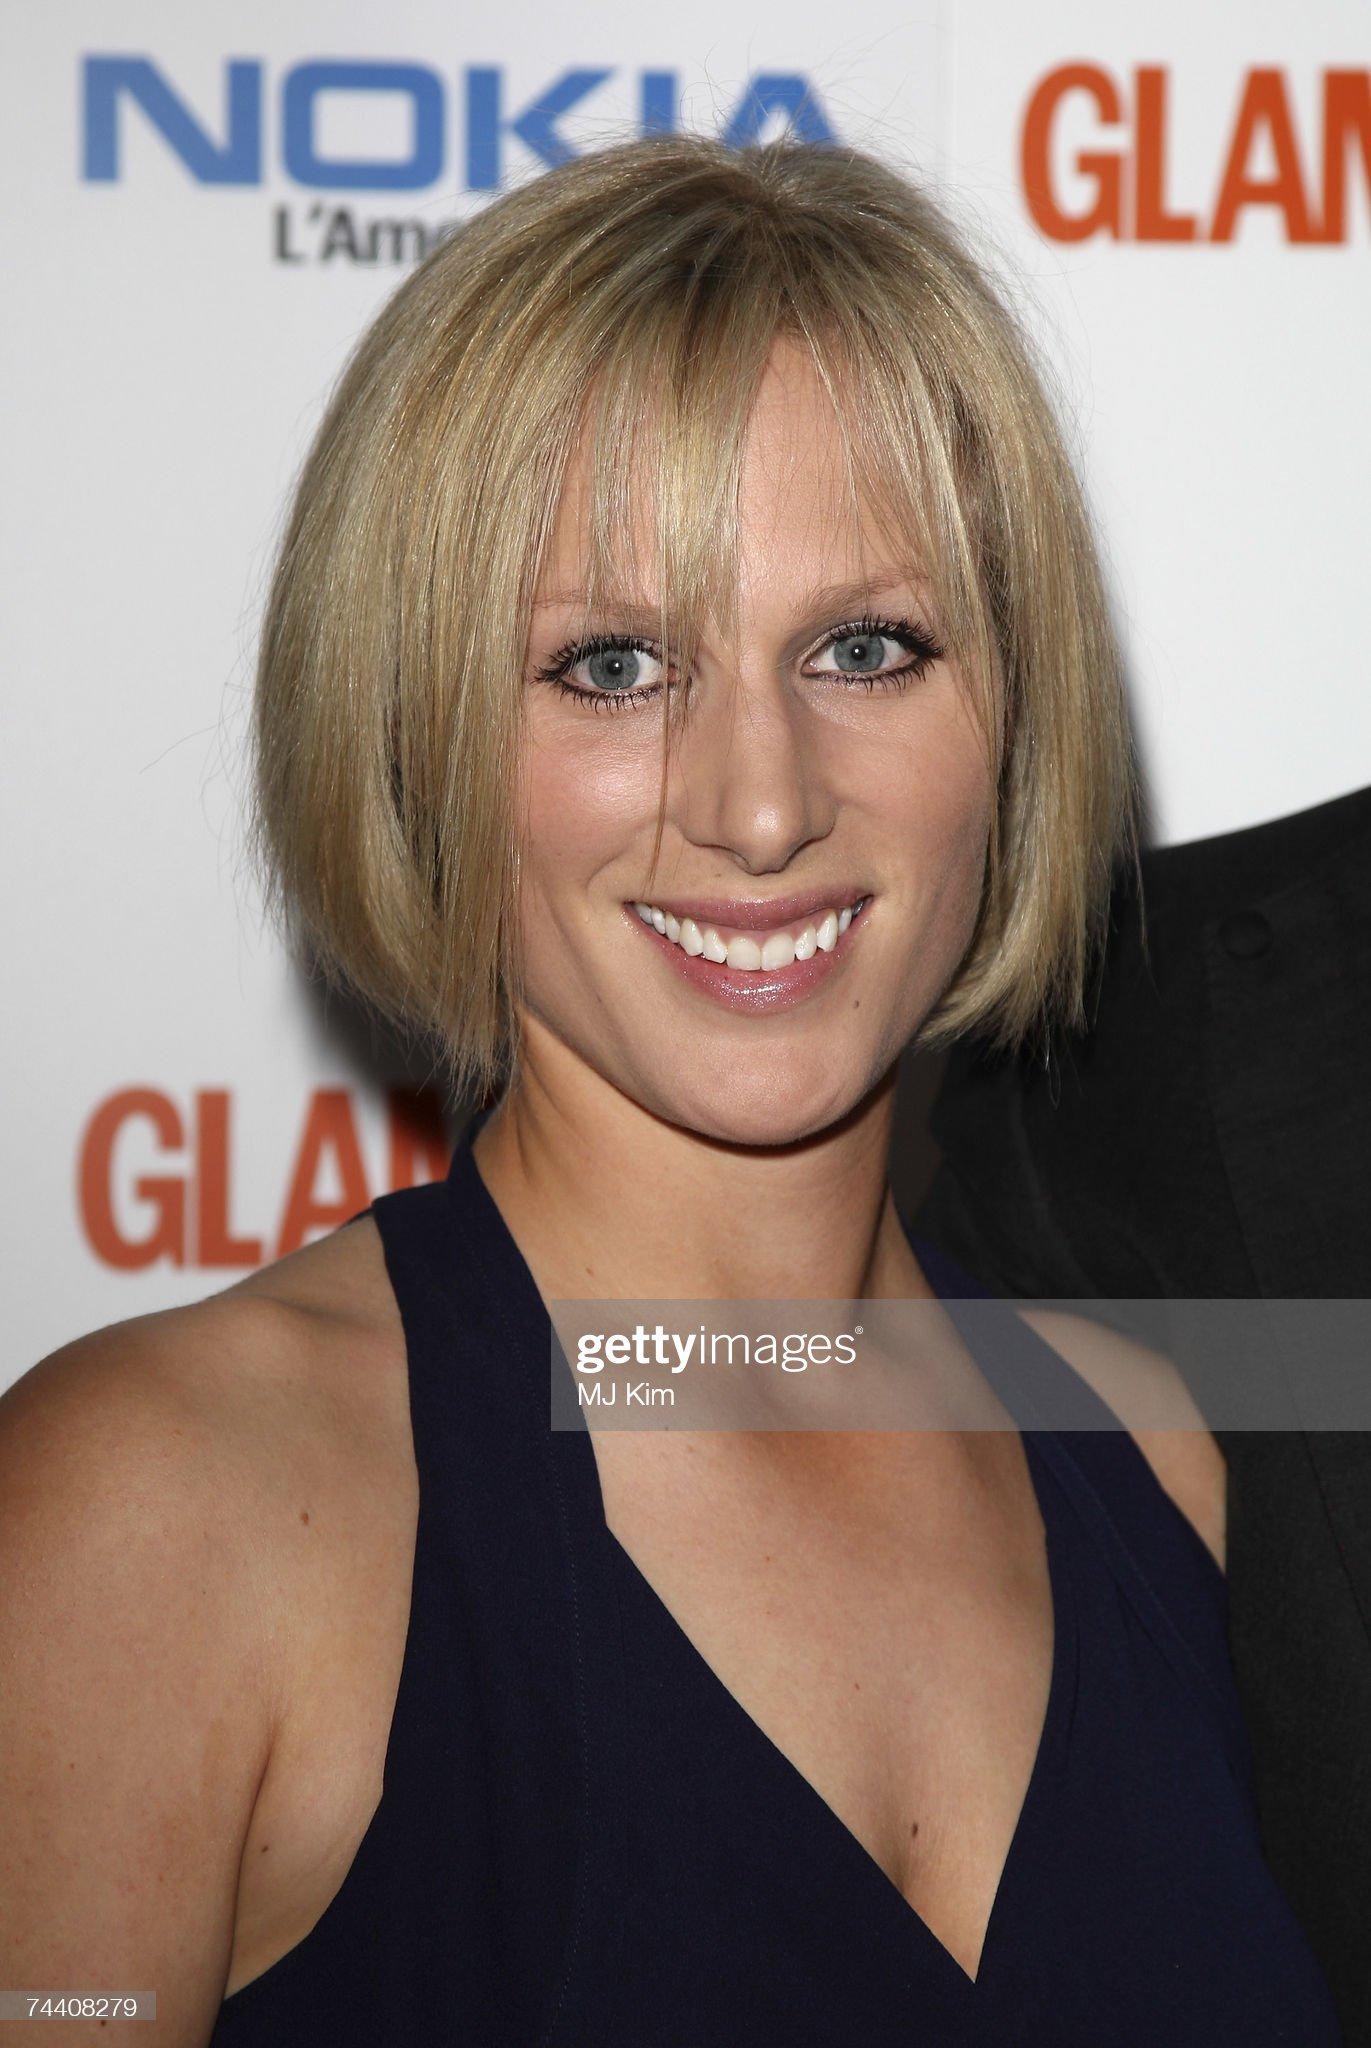 Glamour Awards 2007 - Arrivals : News Photo